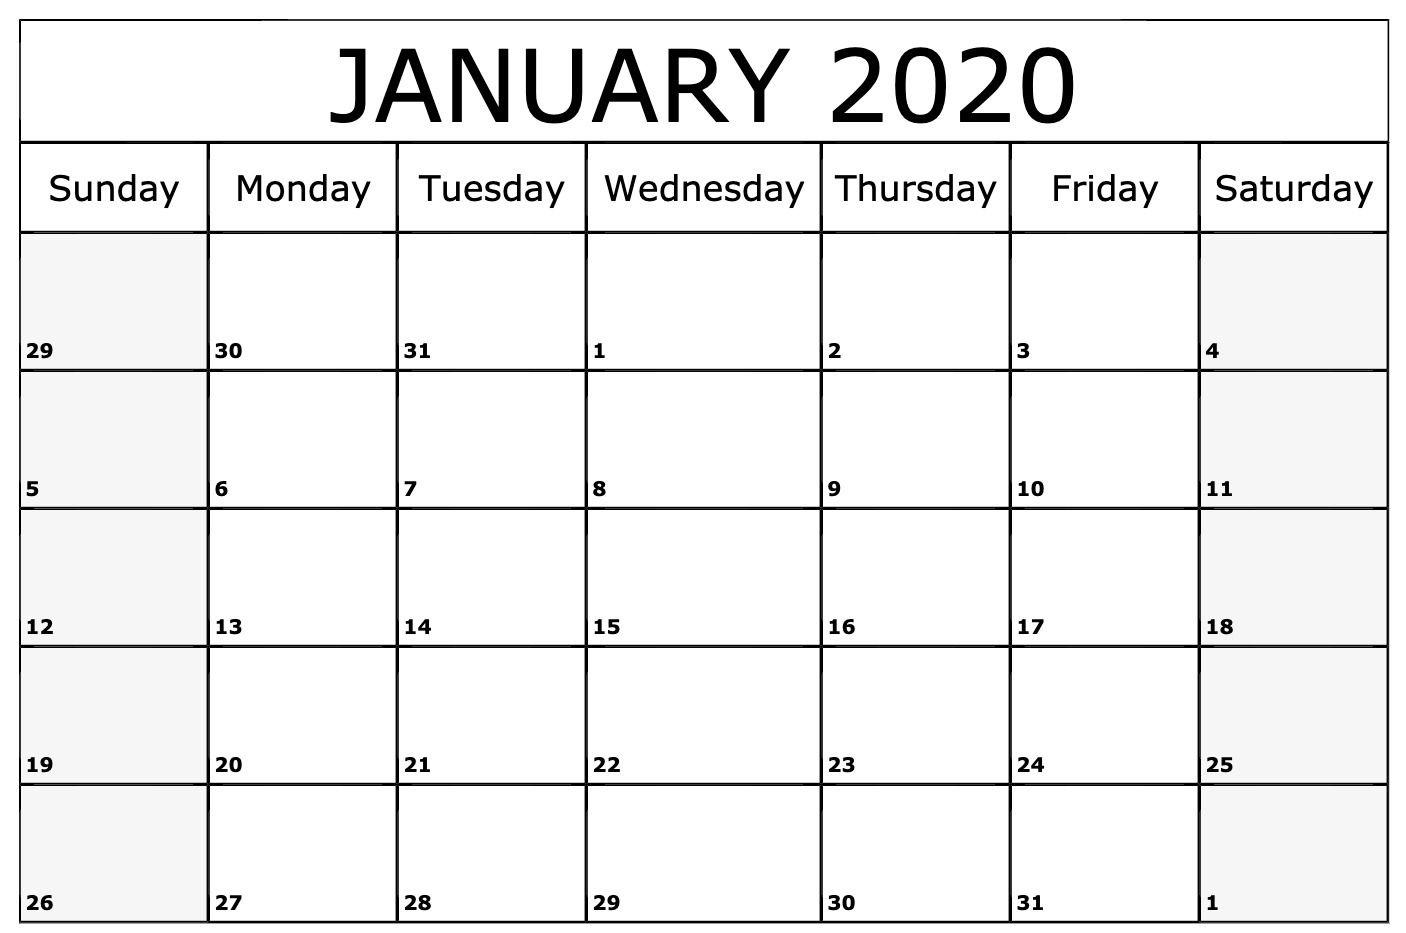 January 2020 Calendar Printable Template | Printable inside 2020 Printable Monthly Calendar Free Vertex